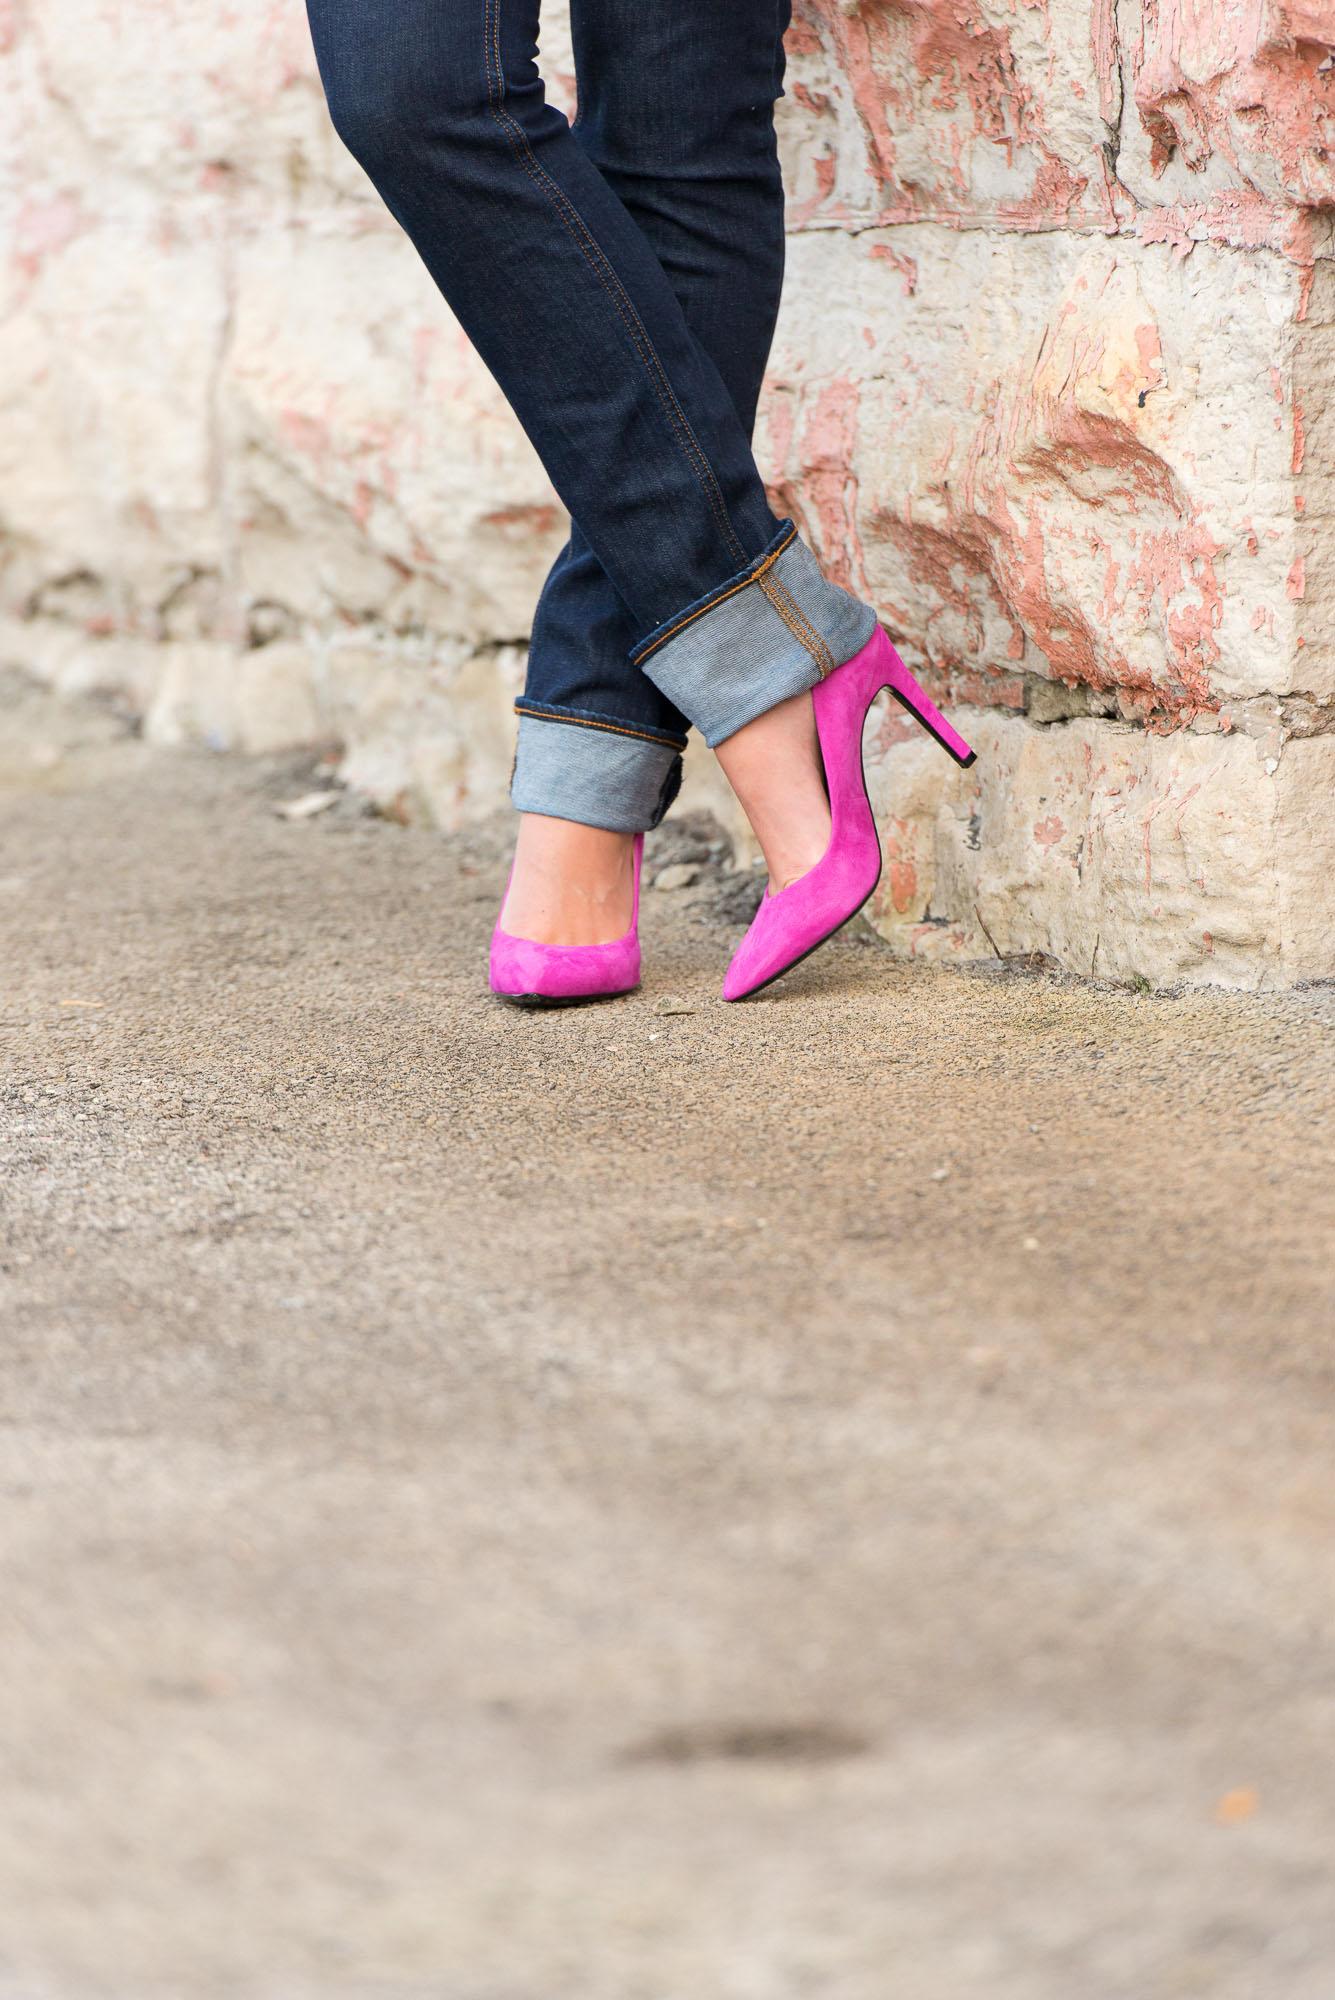 BonjourBlue-Pink Pumps